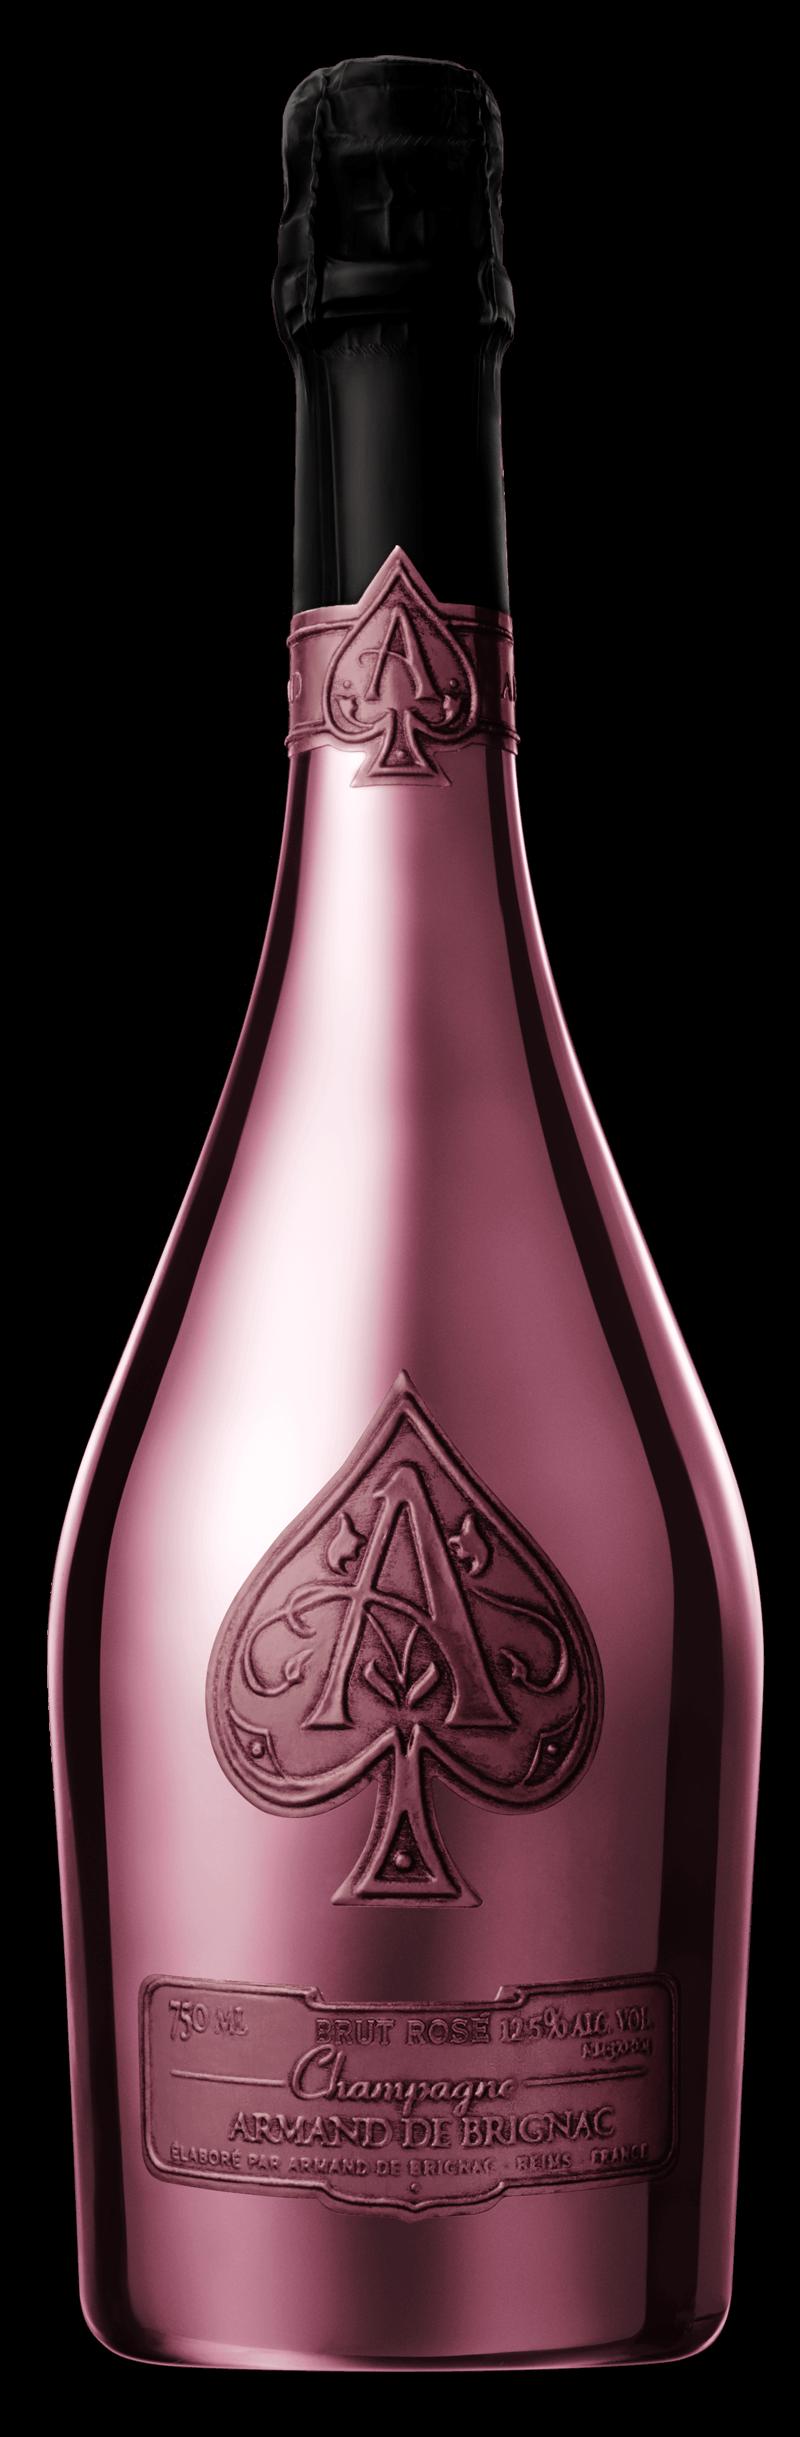 Rosé - Armand de Brignac Champagne